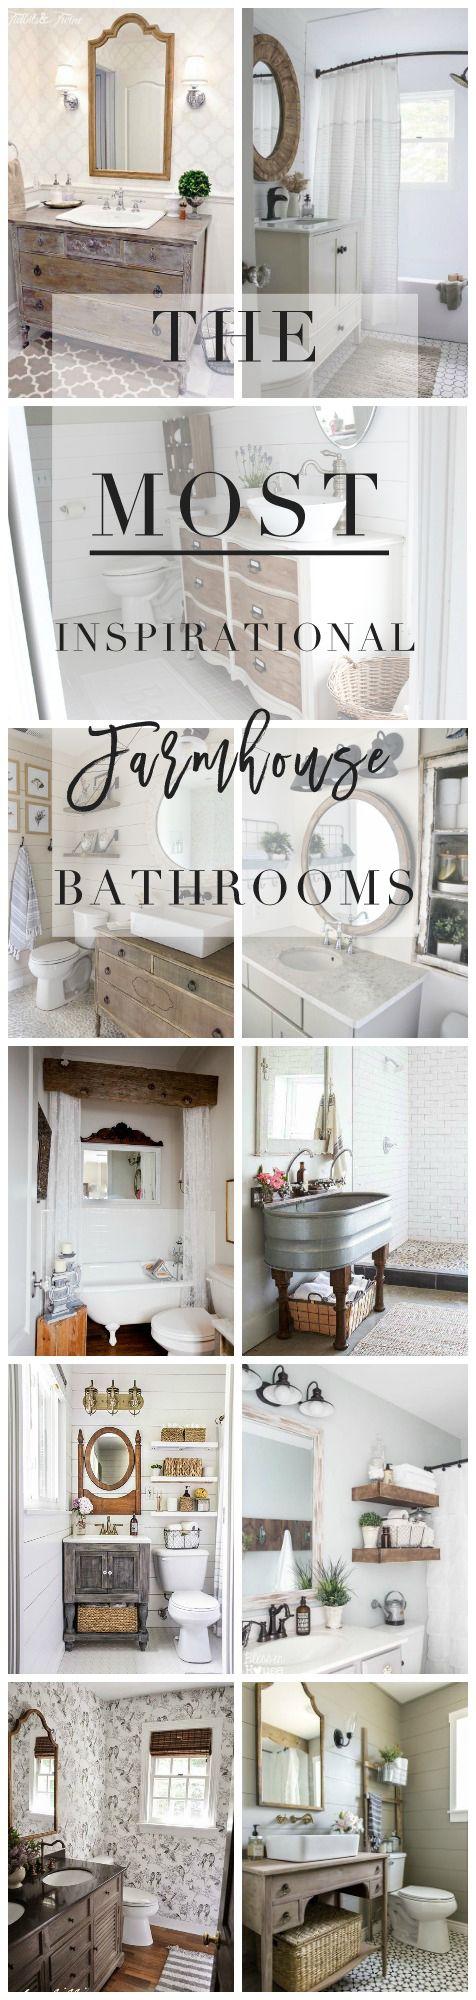 The Most Inspirational Farmhouse Bathrooms - Lynzy & Co.